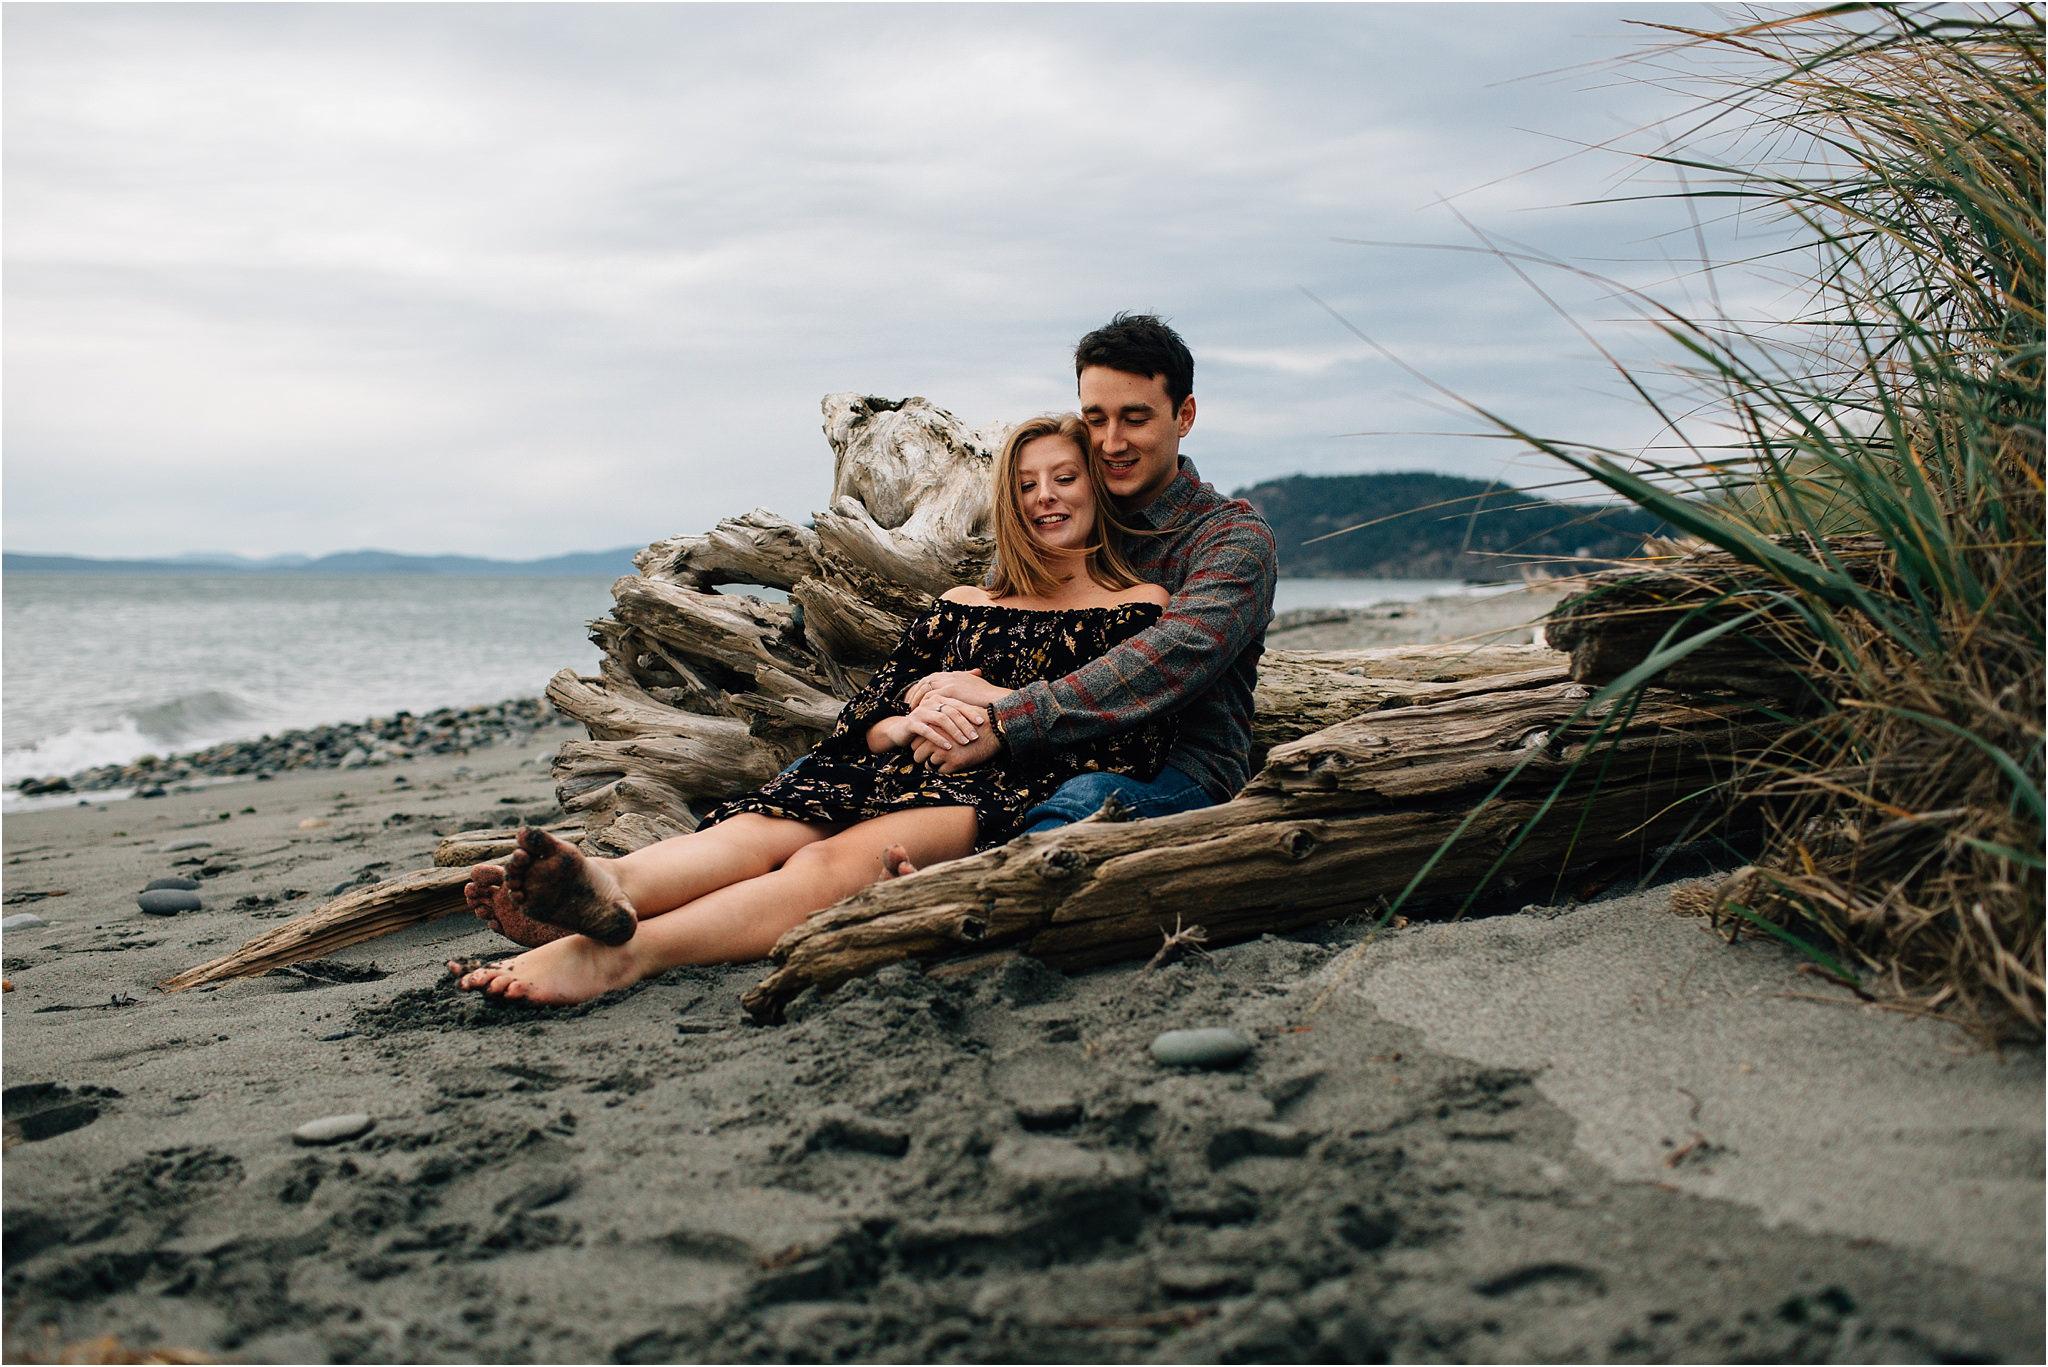 oak-harbor-couples-photographer-deception-pass-38.jpg